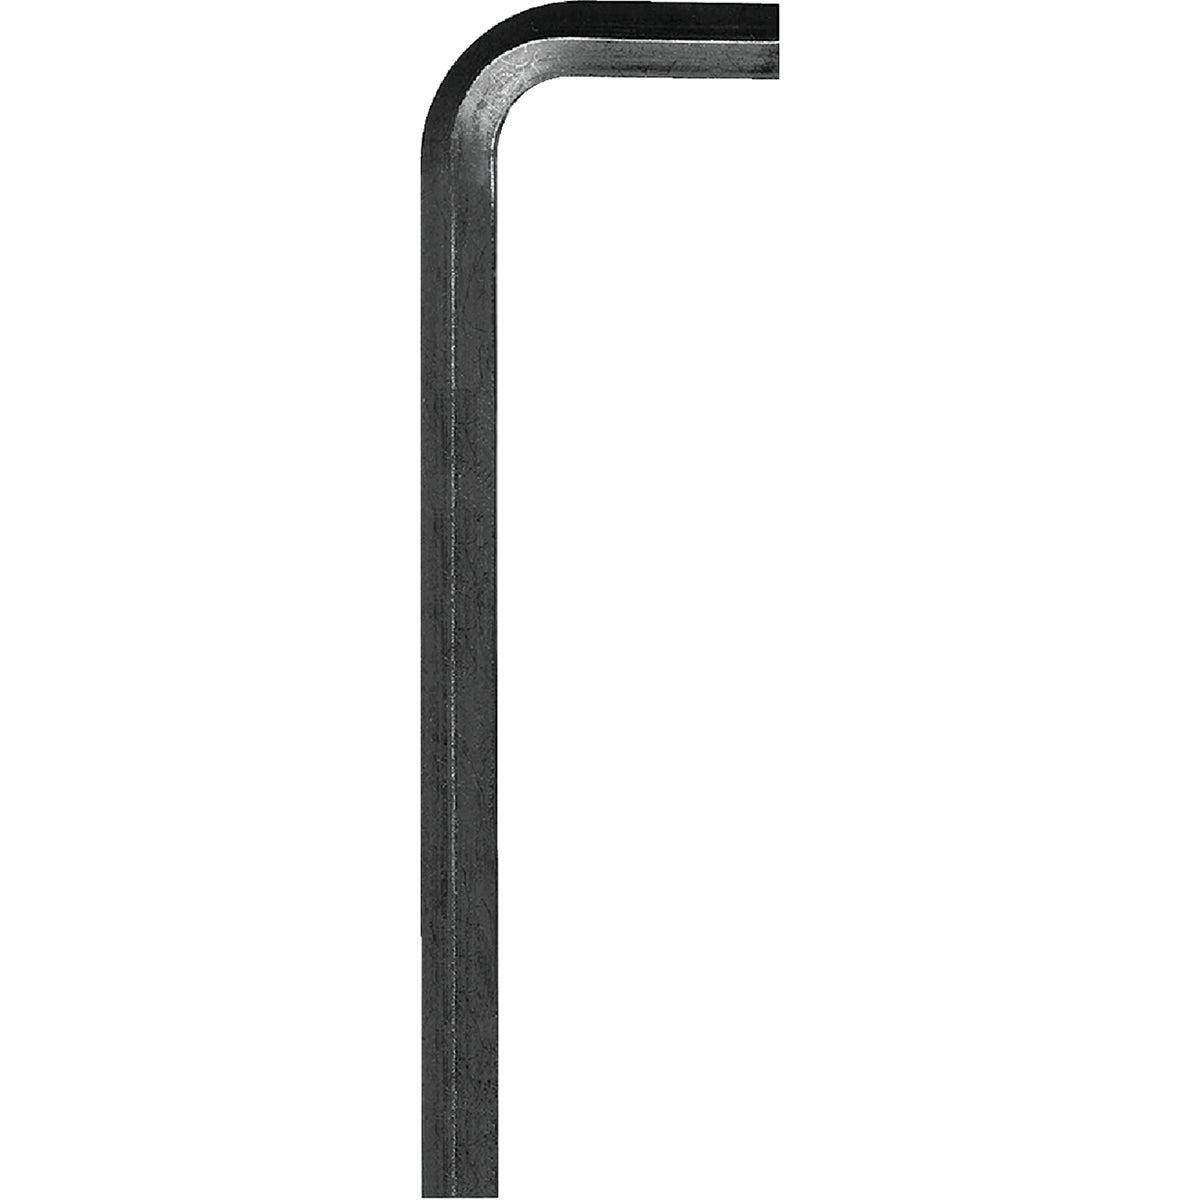 Eklind 1/2 In. Standard Hex Key Wrench